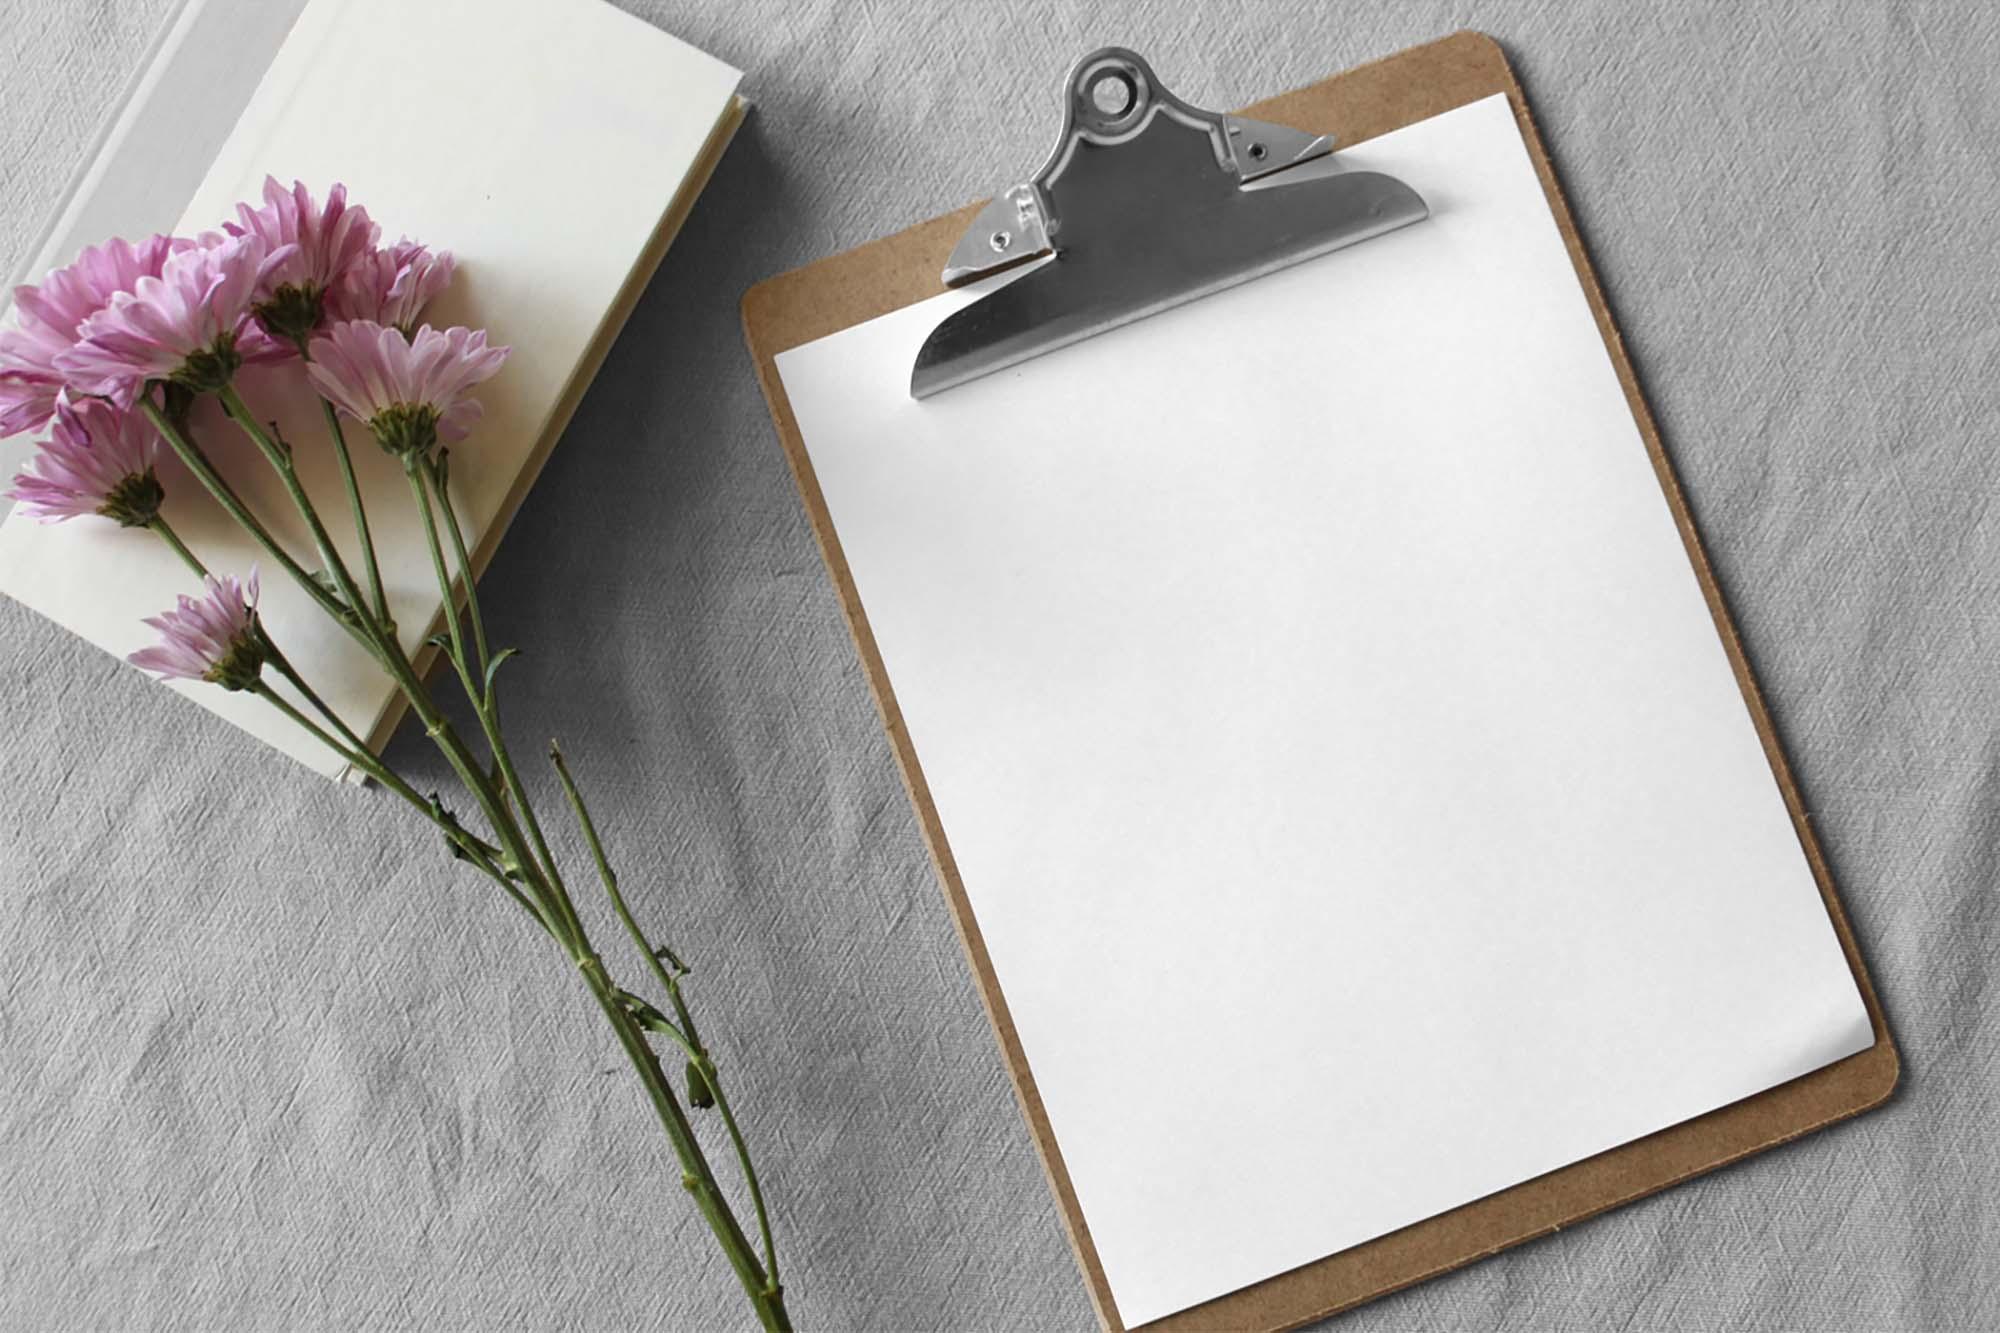 Paper Clipboard Mockup 2